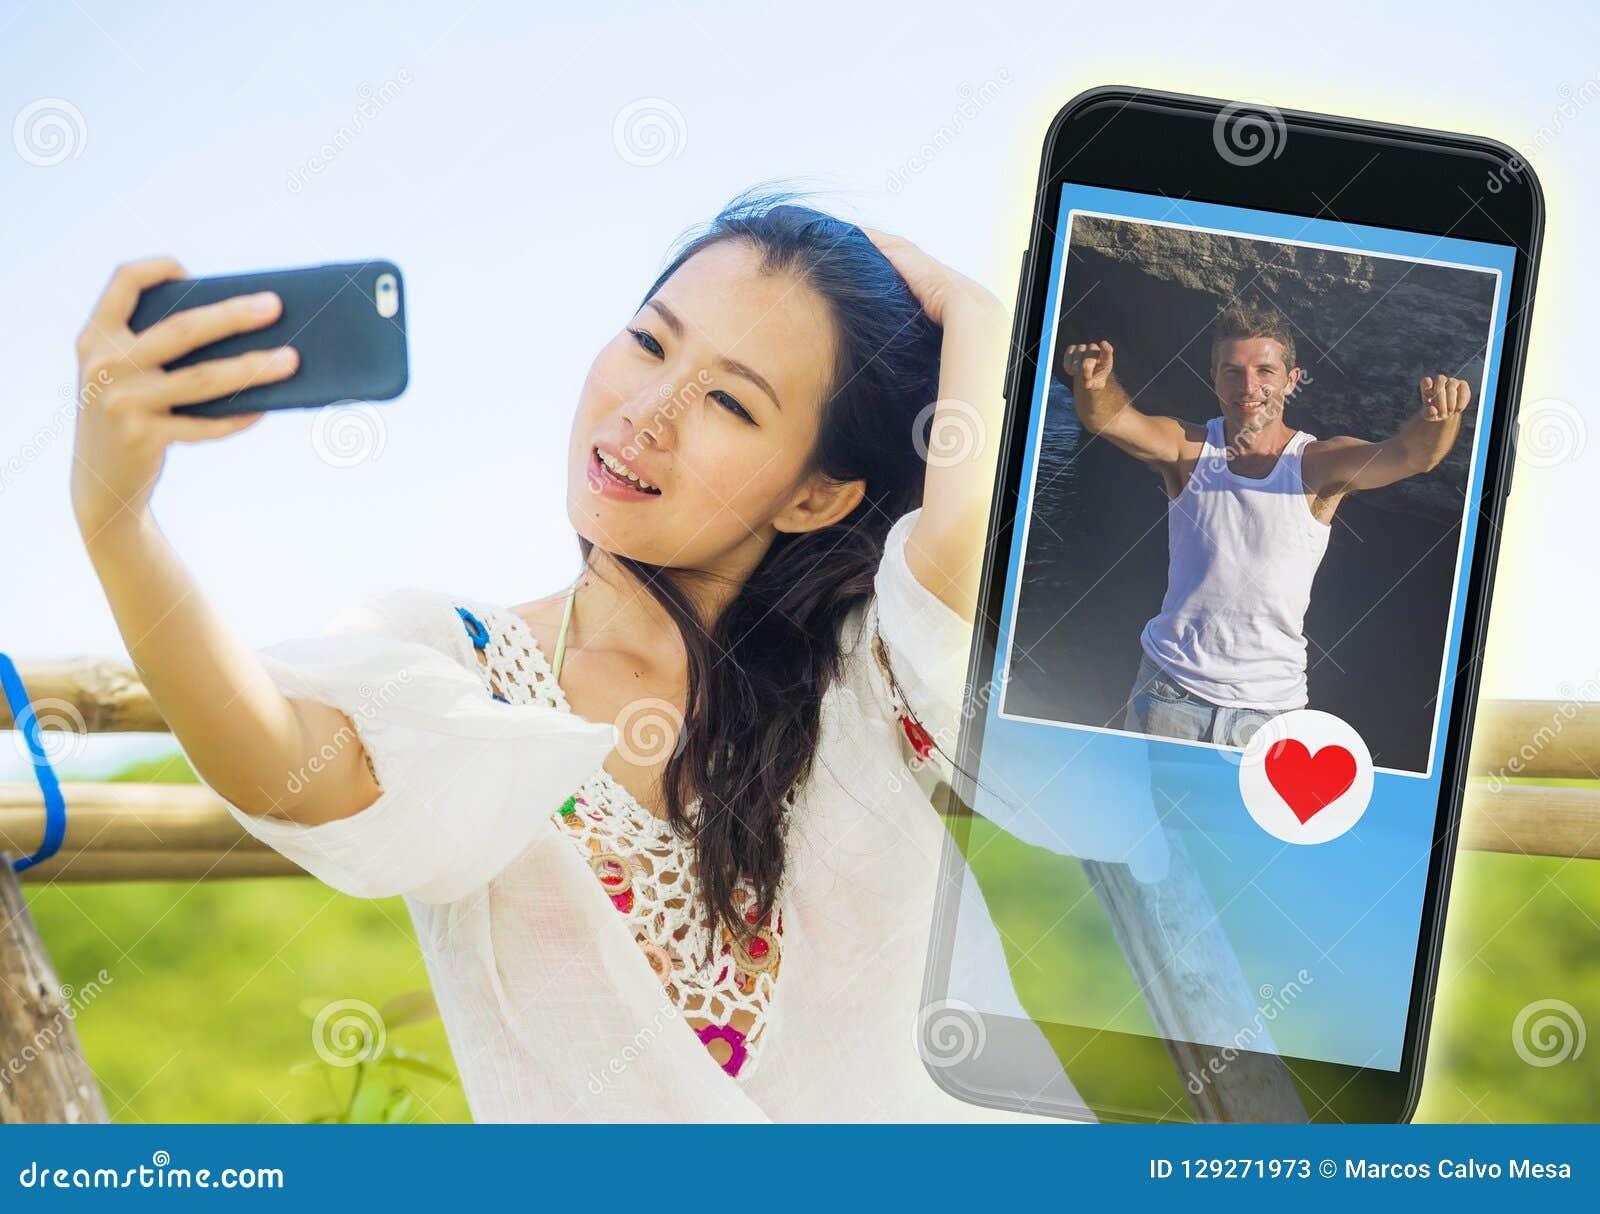 populaire dating apps Korea